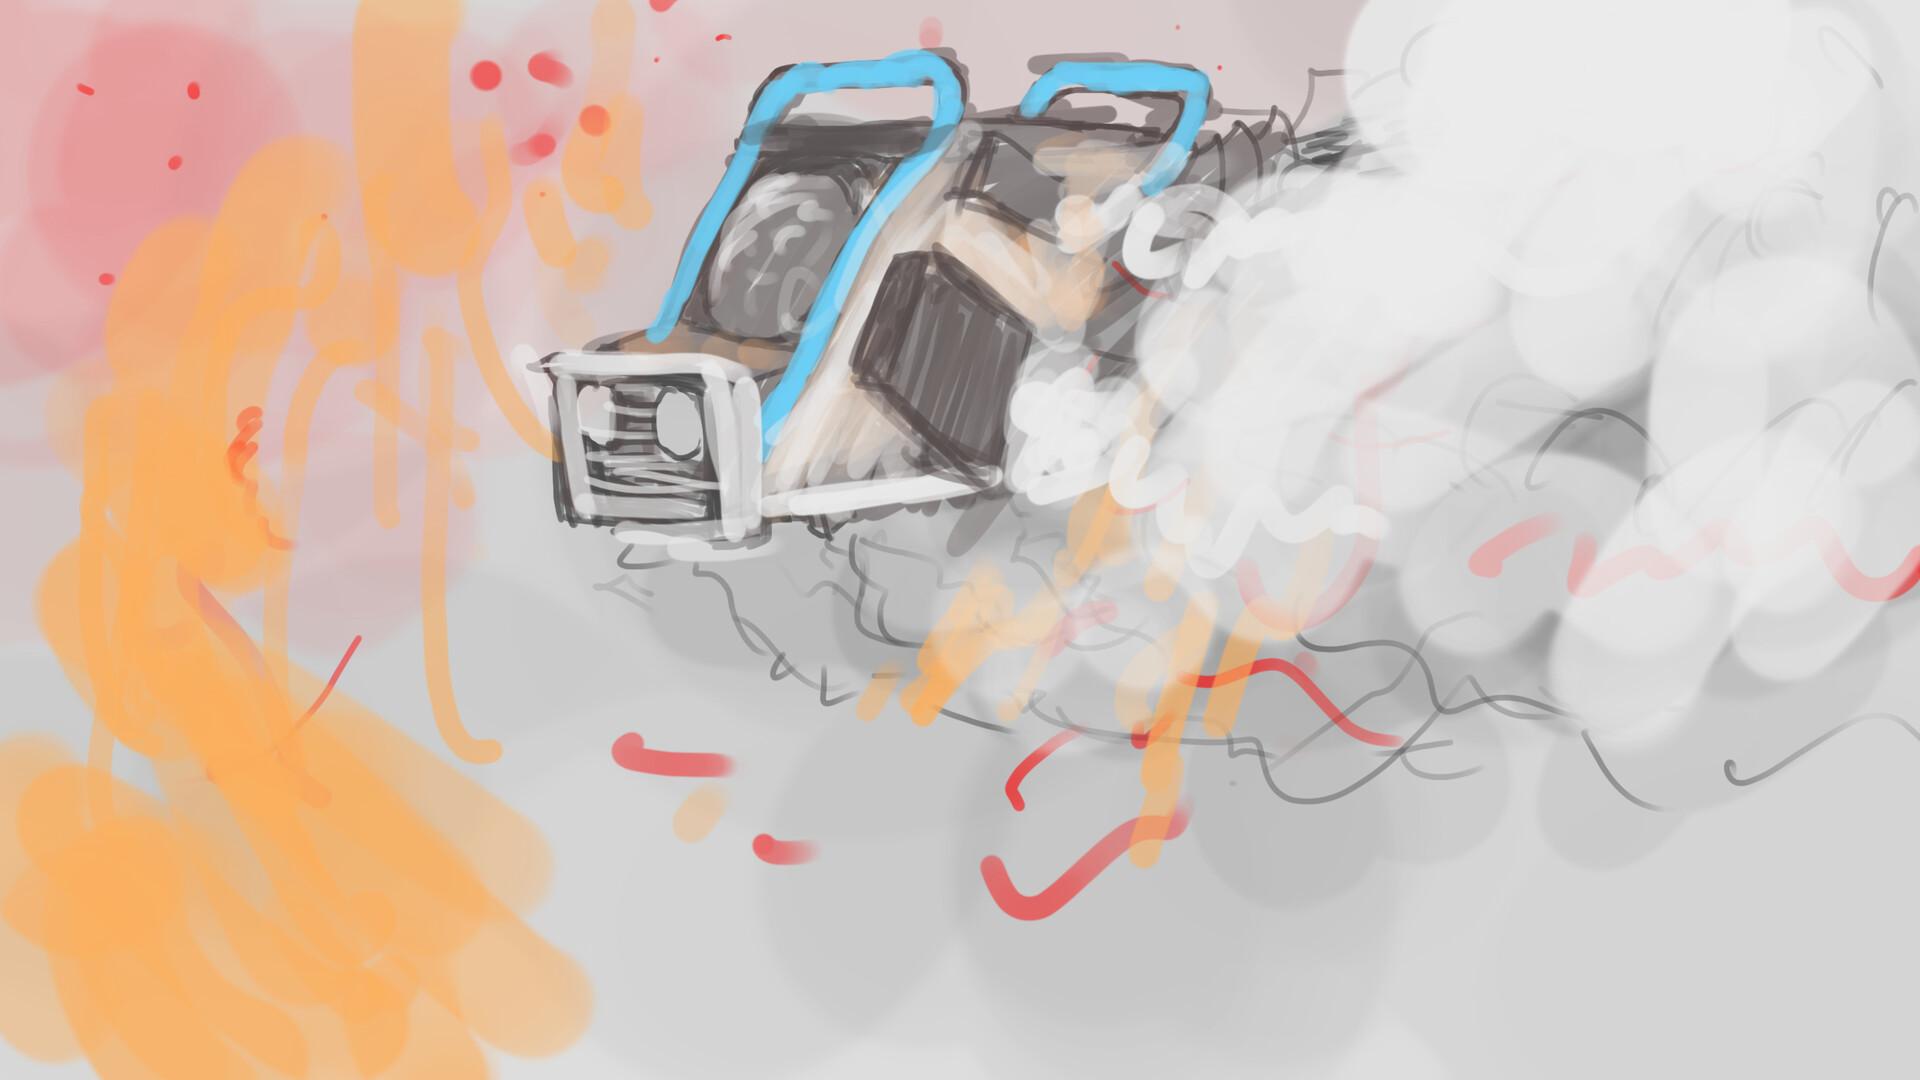 Alexander laheij draw01 01